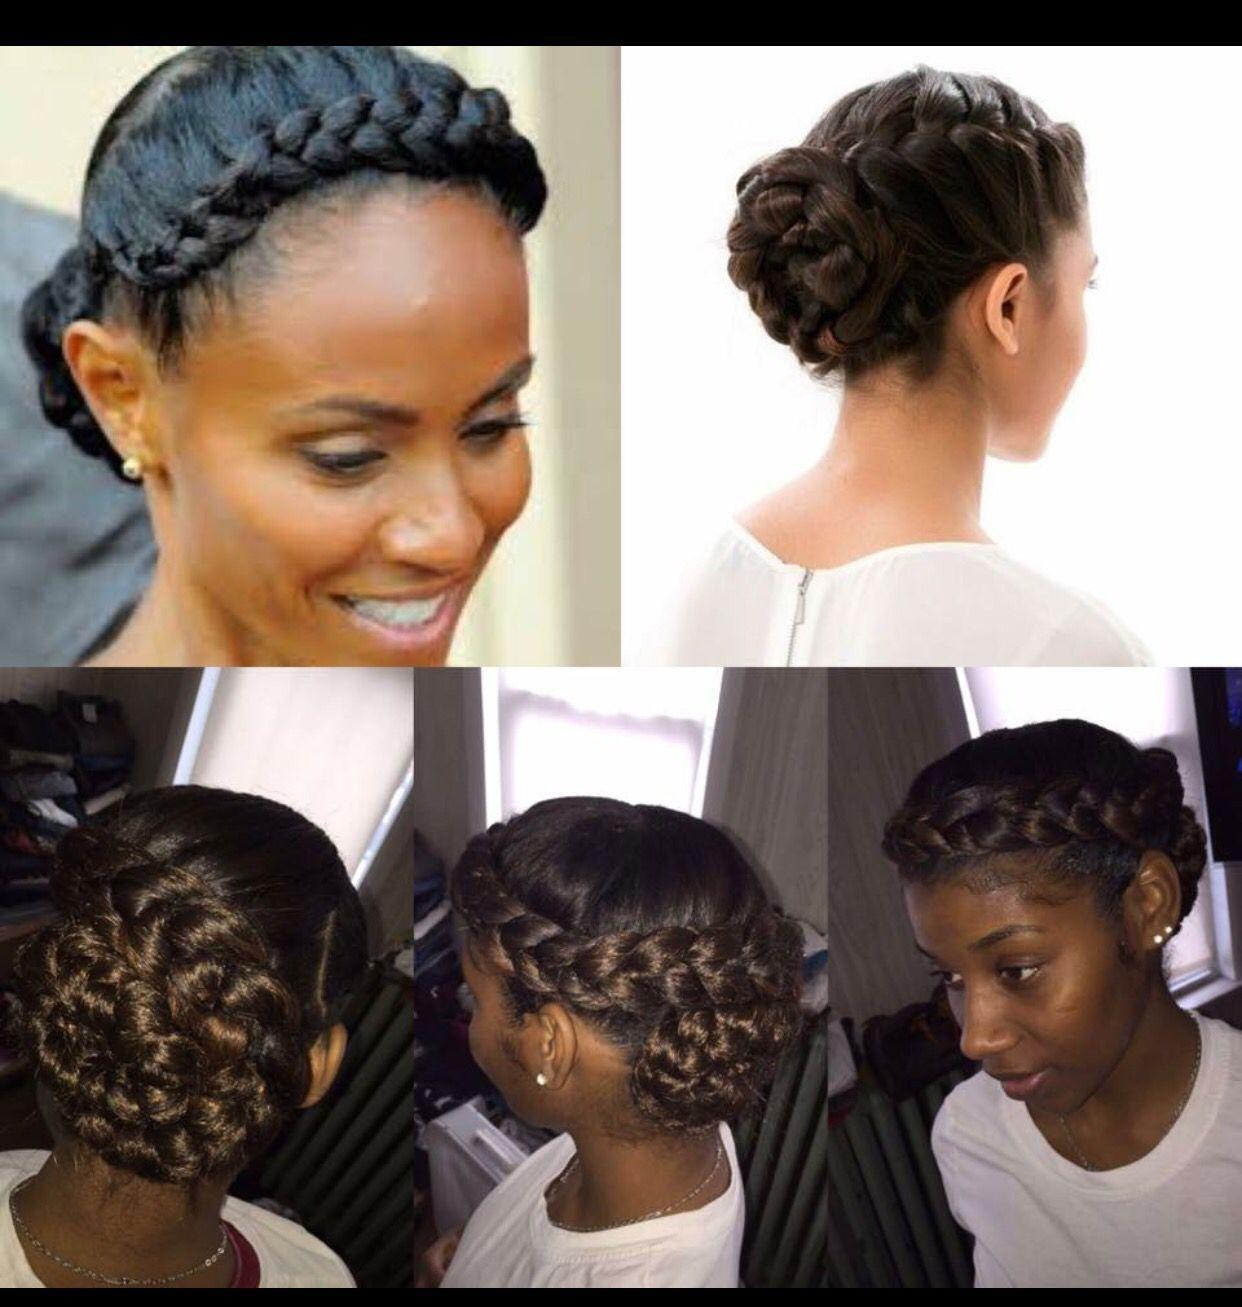 Black Wedding Hairstyles With Crown: Braided Hairstyles, Crown